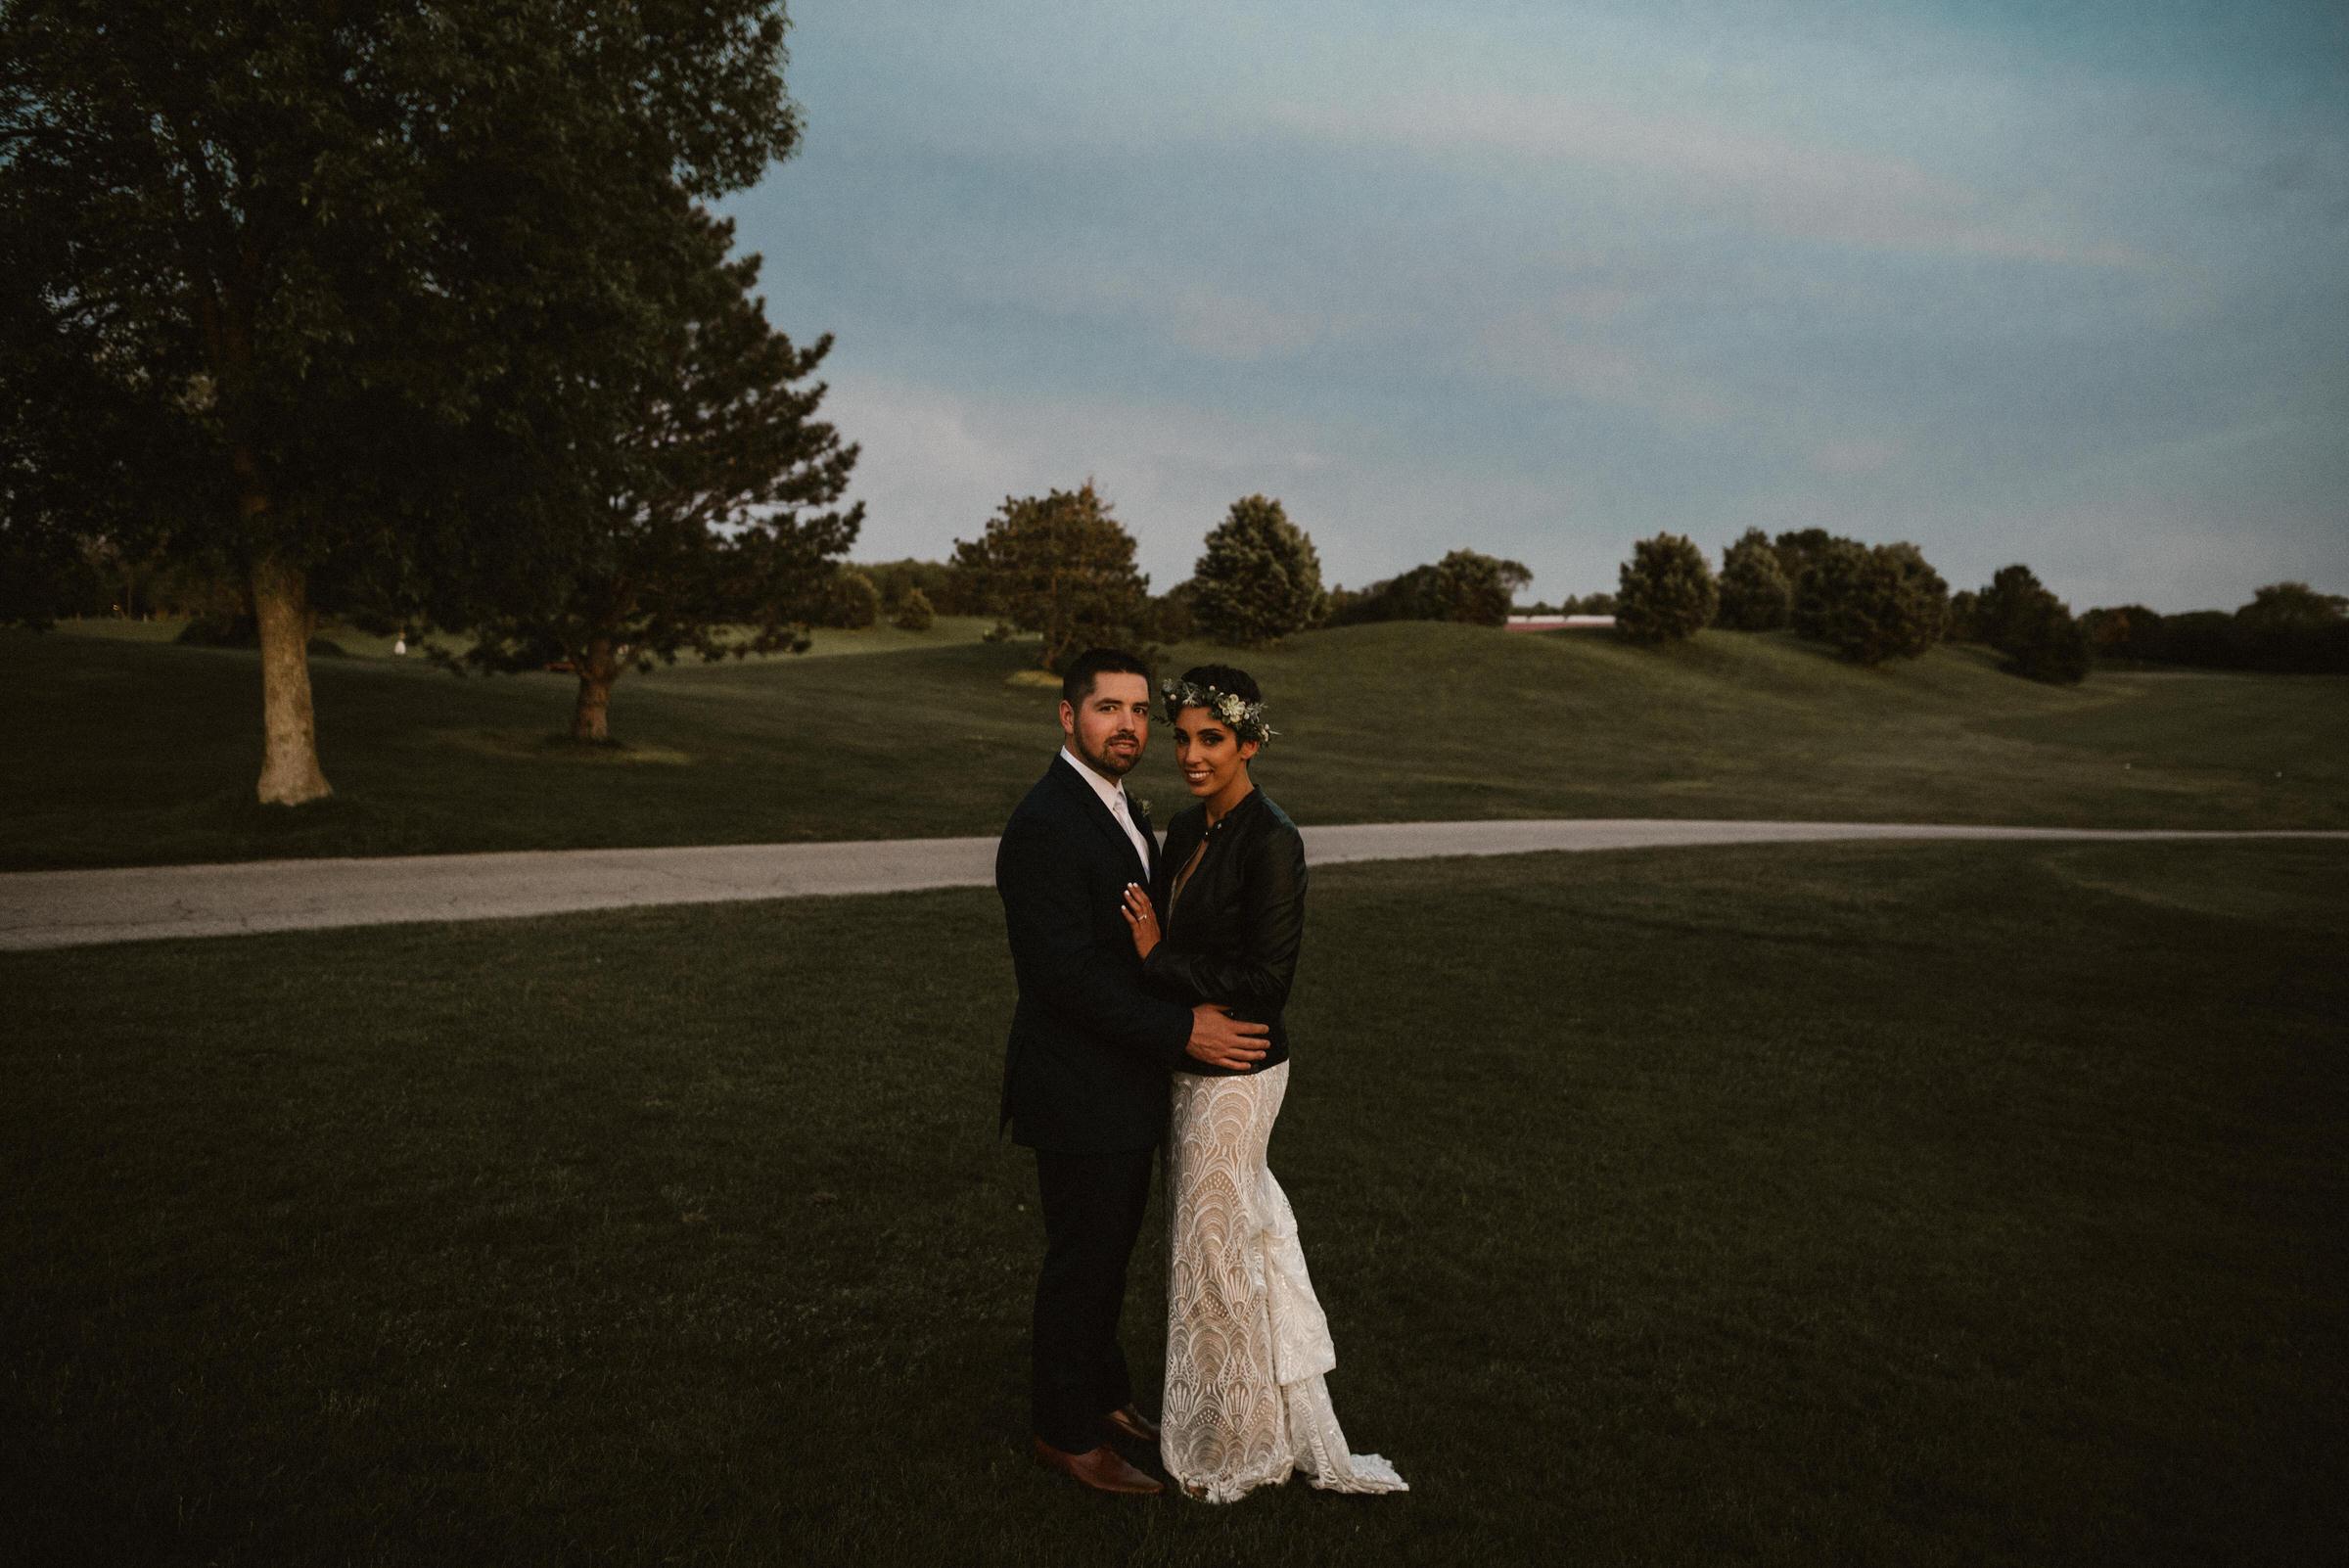 Wilderness-Ridge-Lincoln-Nebraska-Wedding-Kaylie-Sirek-Photography-131.jpg